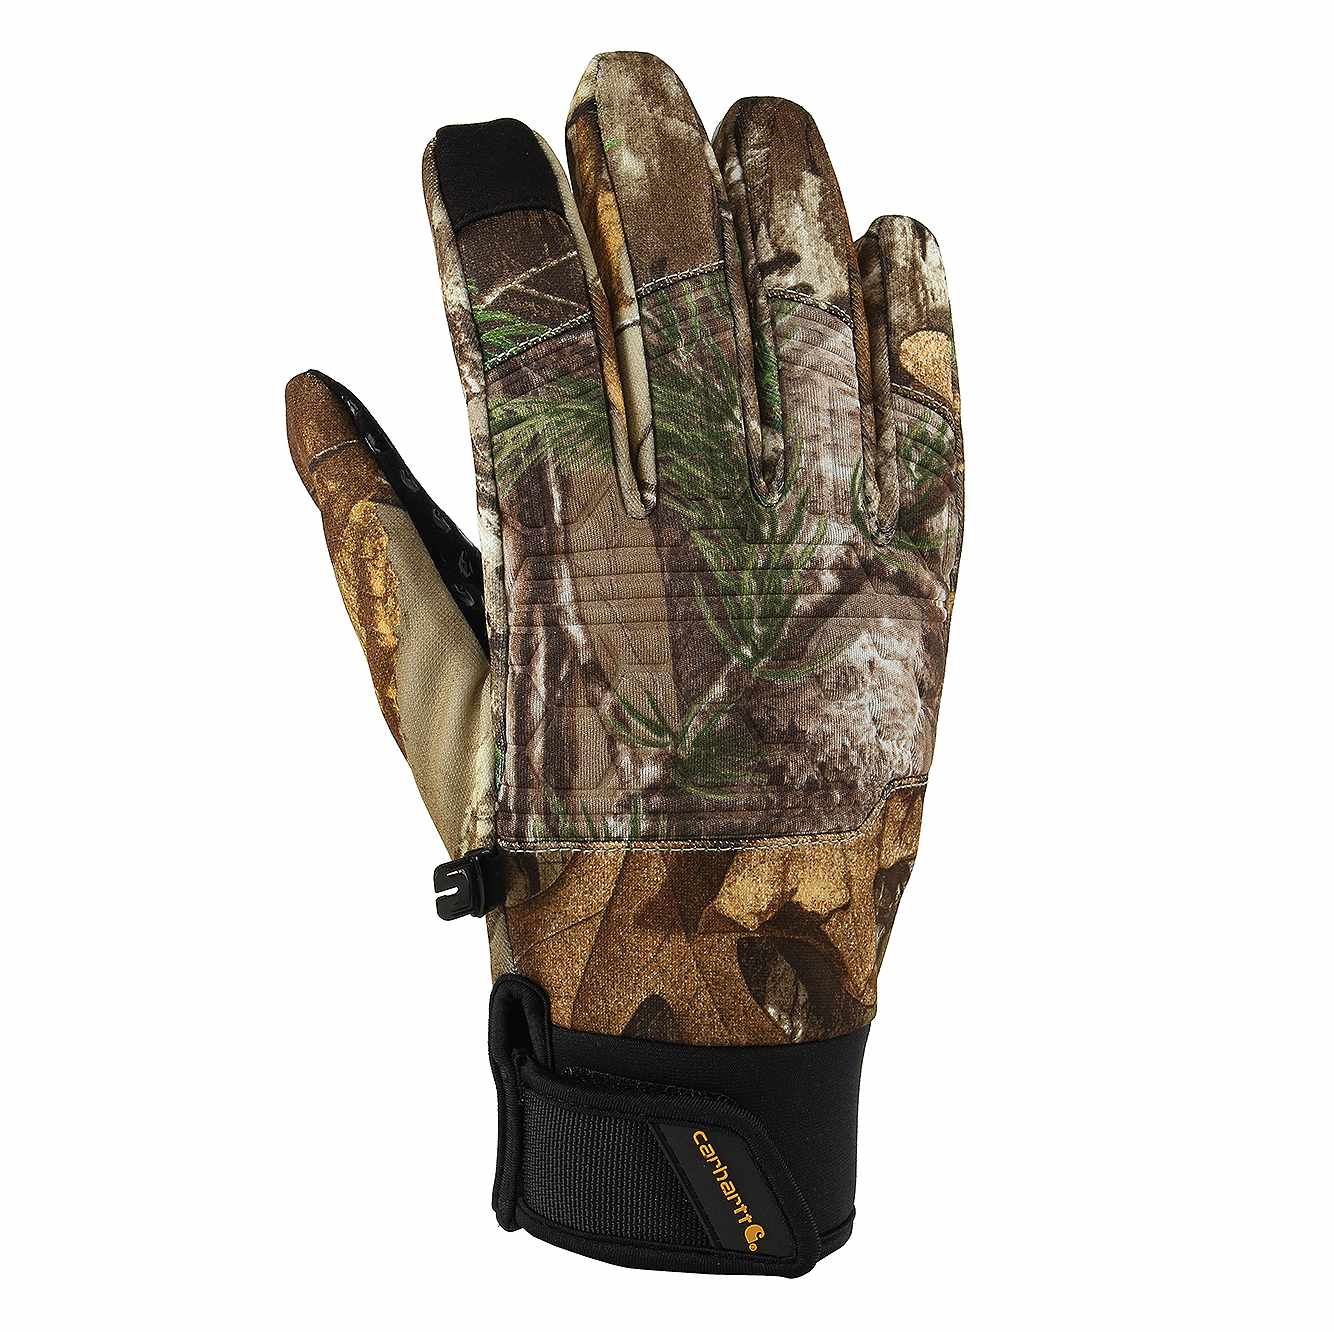 Midweight Shooting Camo Glove